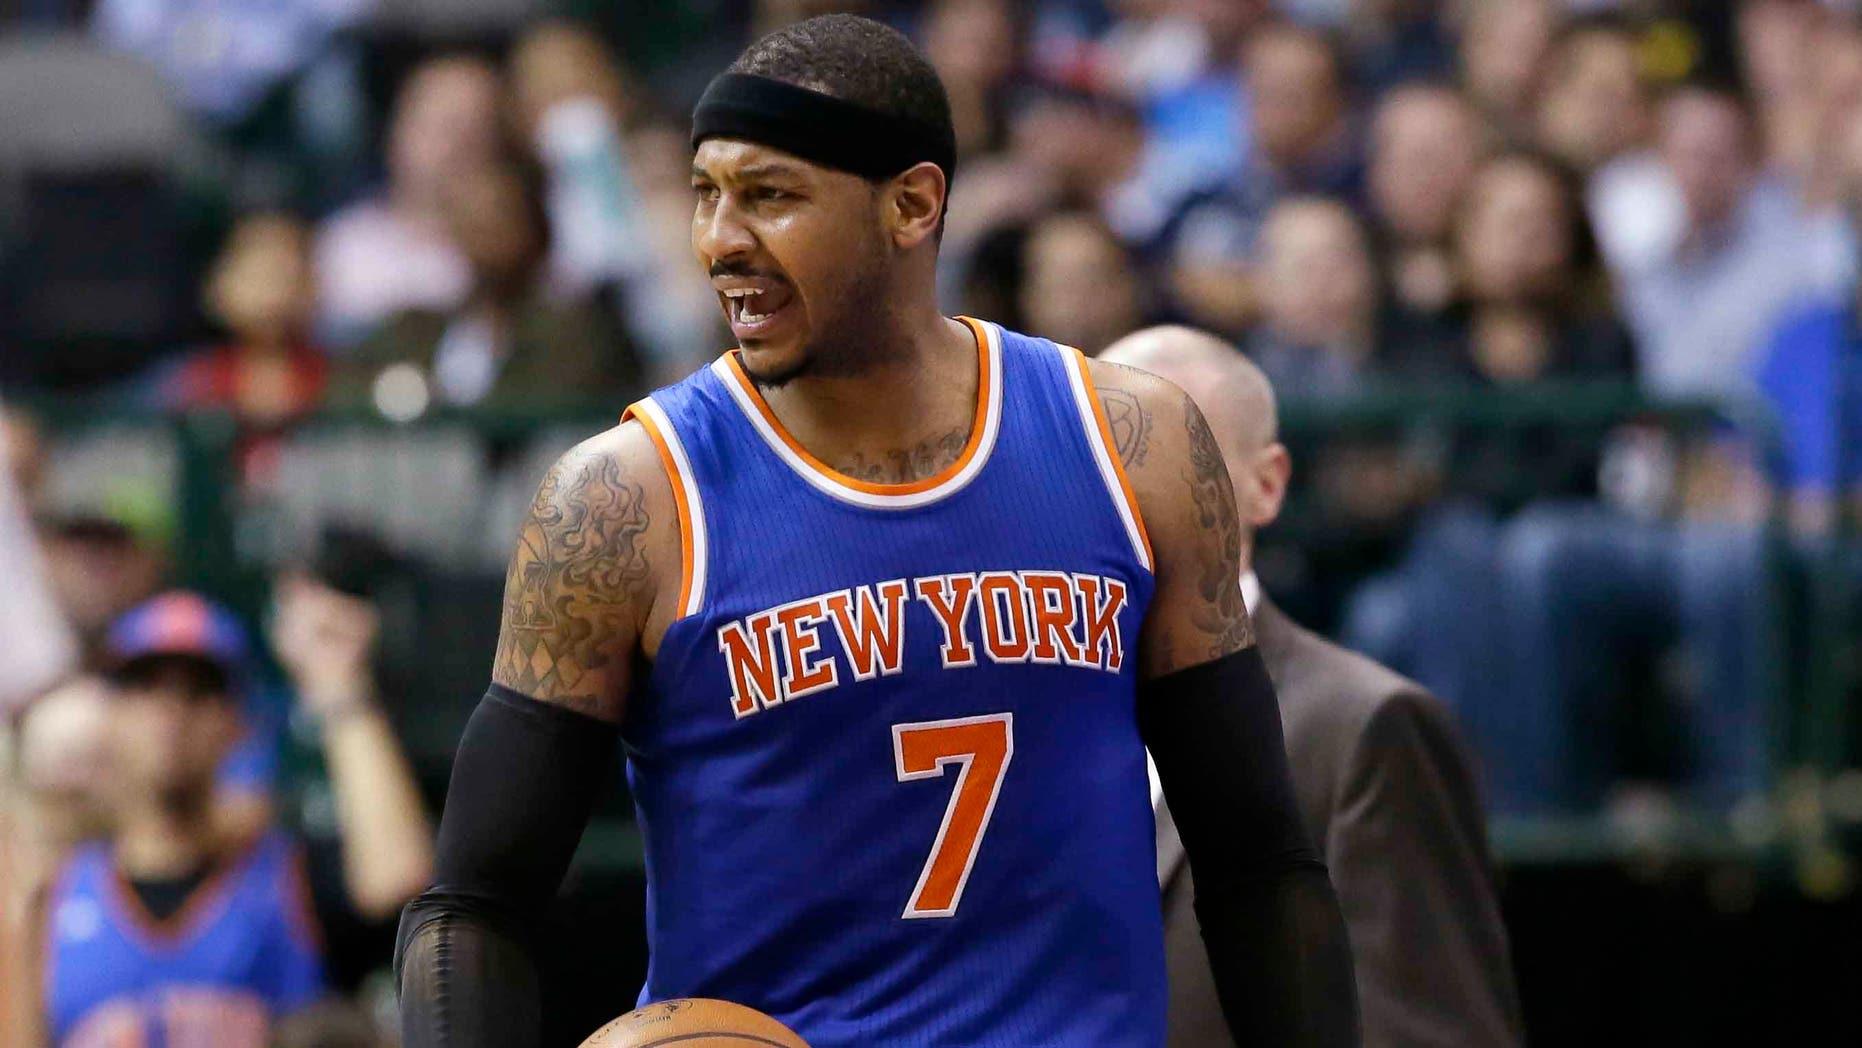 New York Knicks forward Carmelo Anthony.